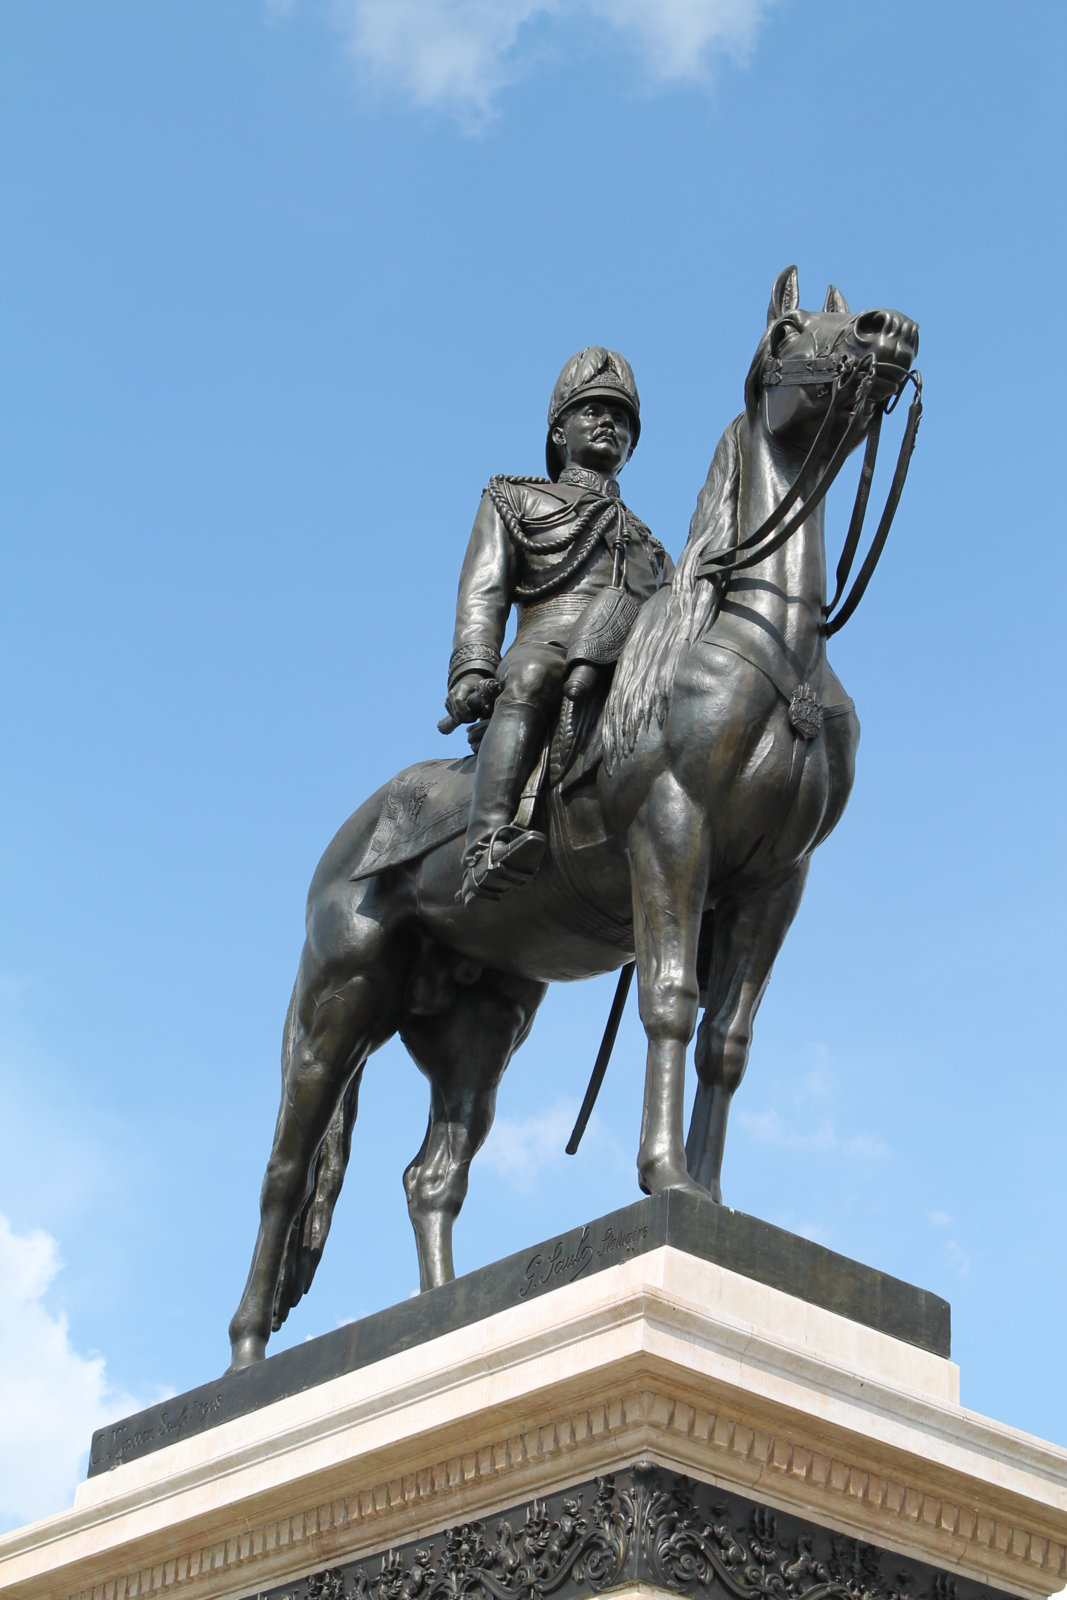 The_Equestrian_Statue_of_King_Chulalongkorn_Rama_V_the_Great.JPG